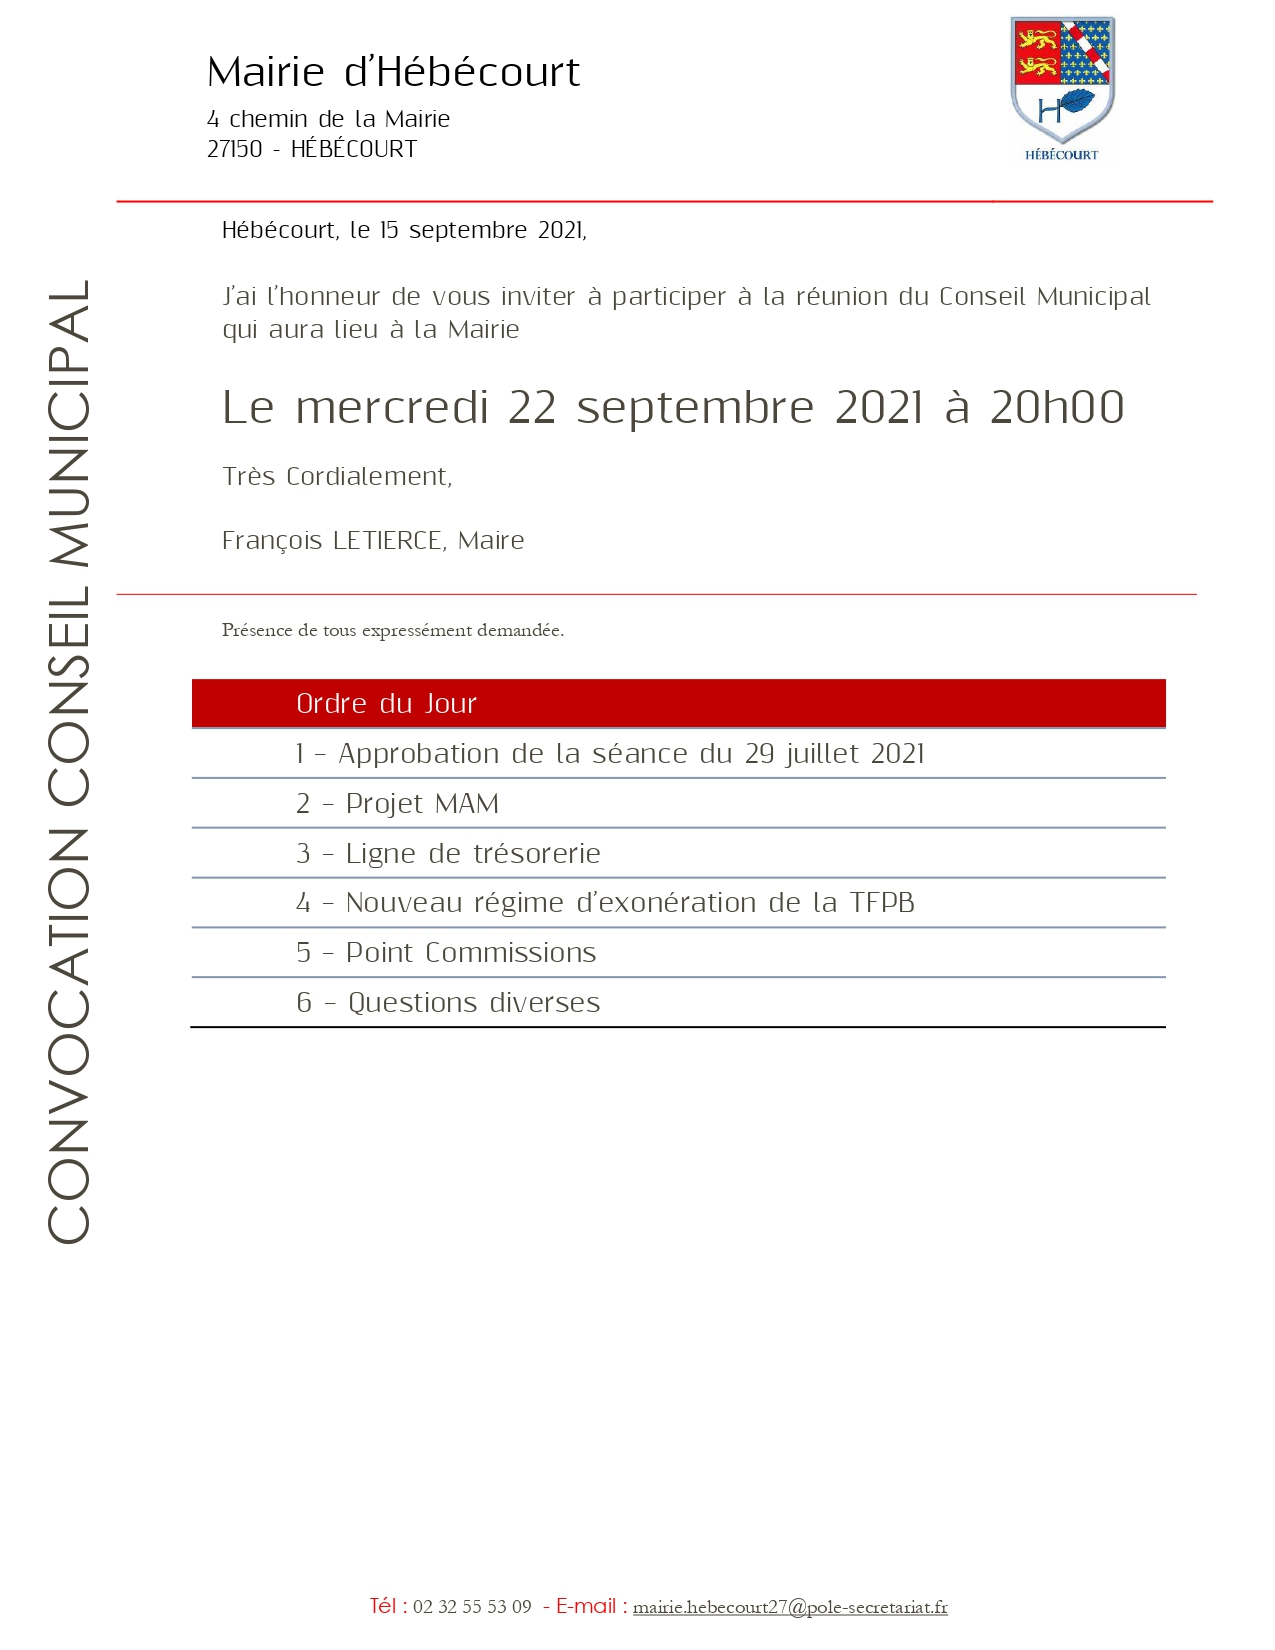 HEBECOURT Convocat CM 22 09 21_page-0001.jpg